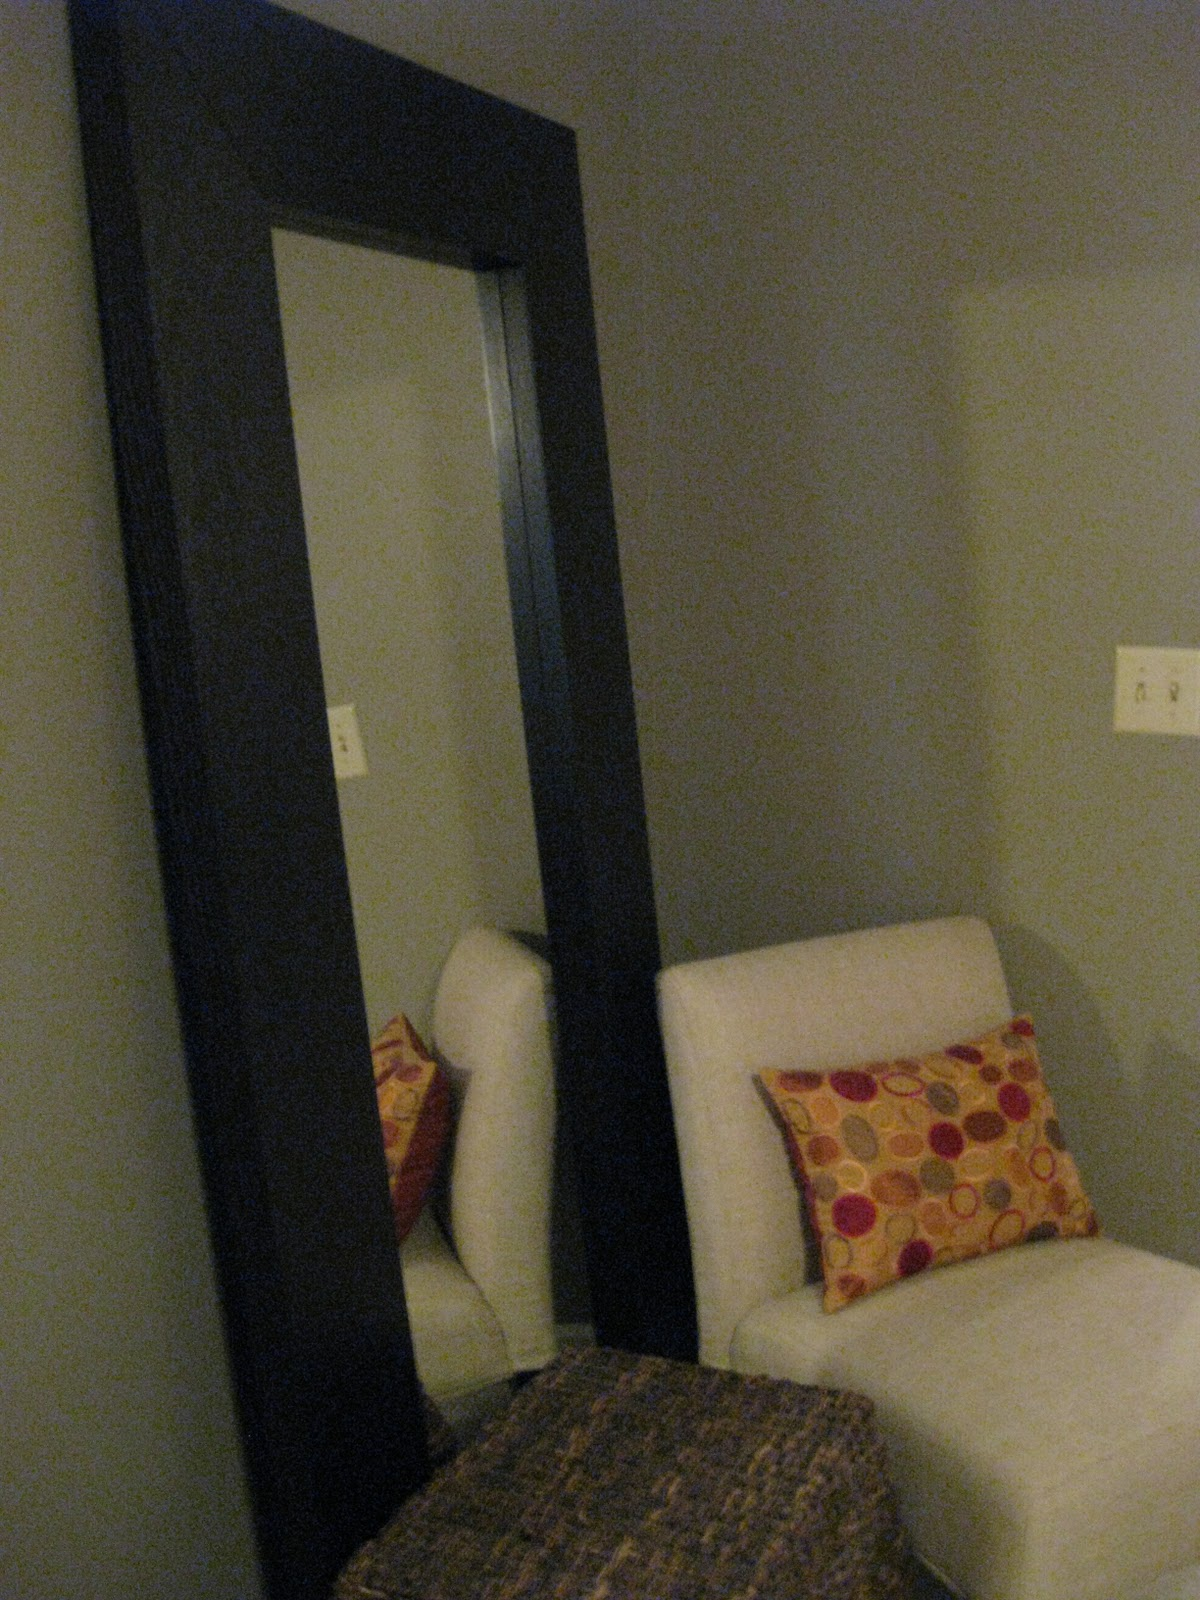 Ikea Mongstad Mirror The Bozeman Bungalow I Heart Ikea